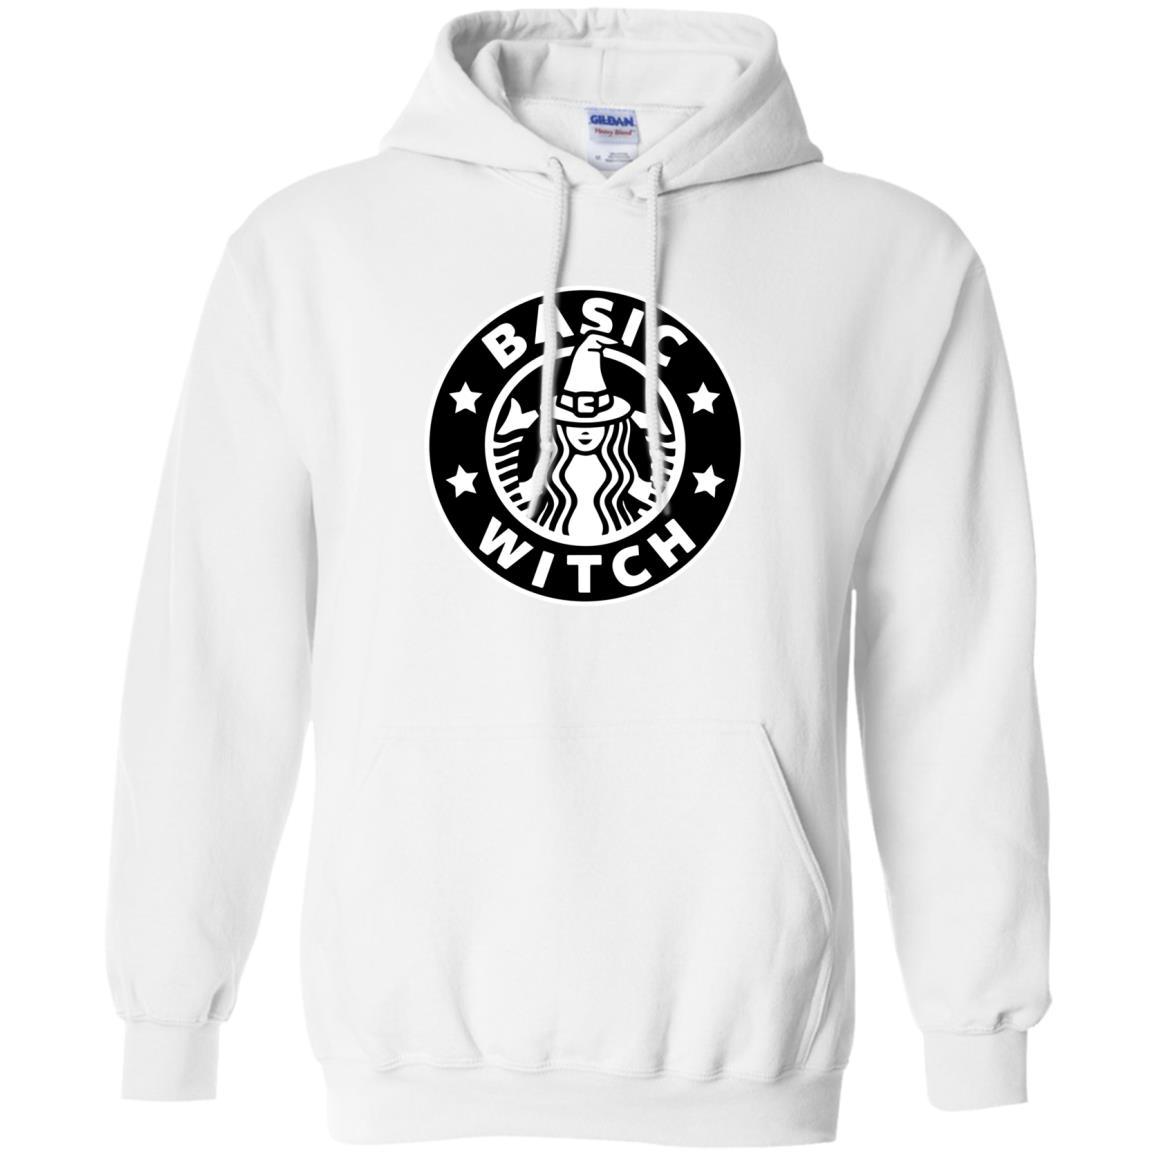 image 1019 - Basic Witch Shirt, Halloween Starbuck parody